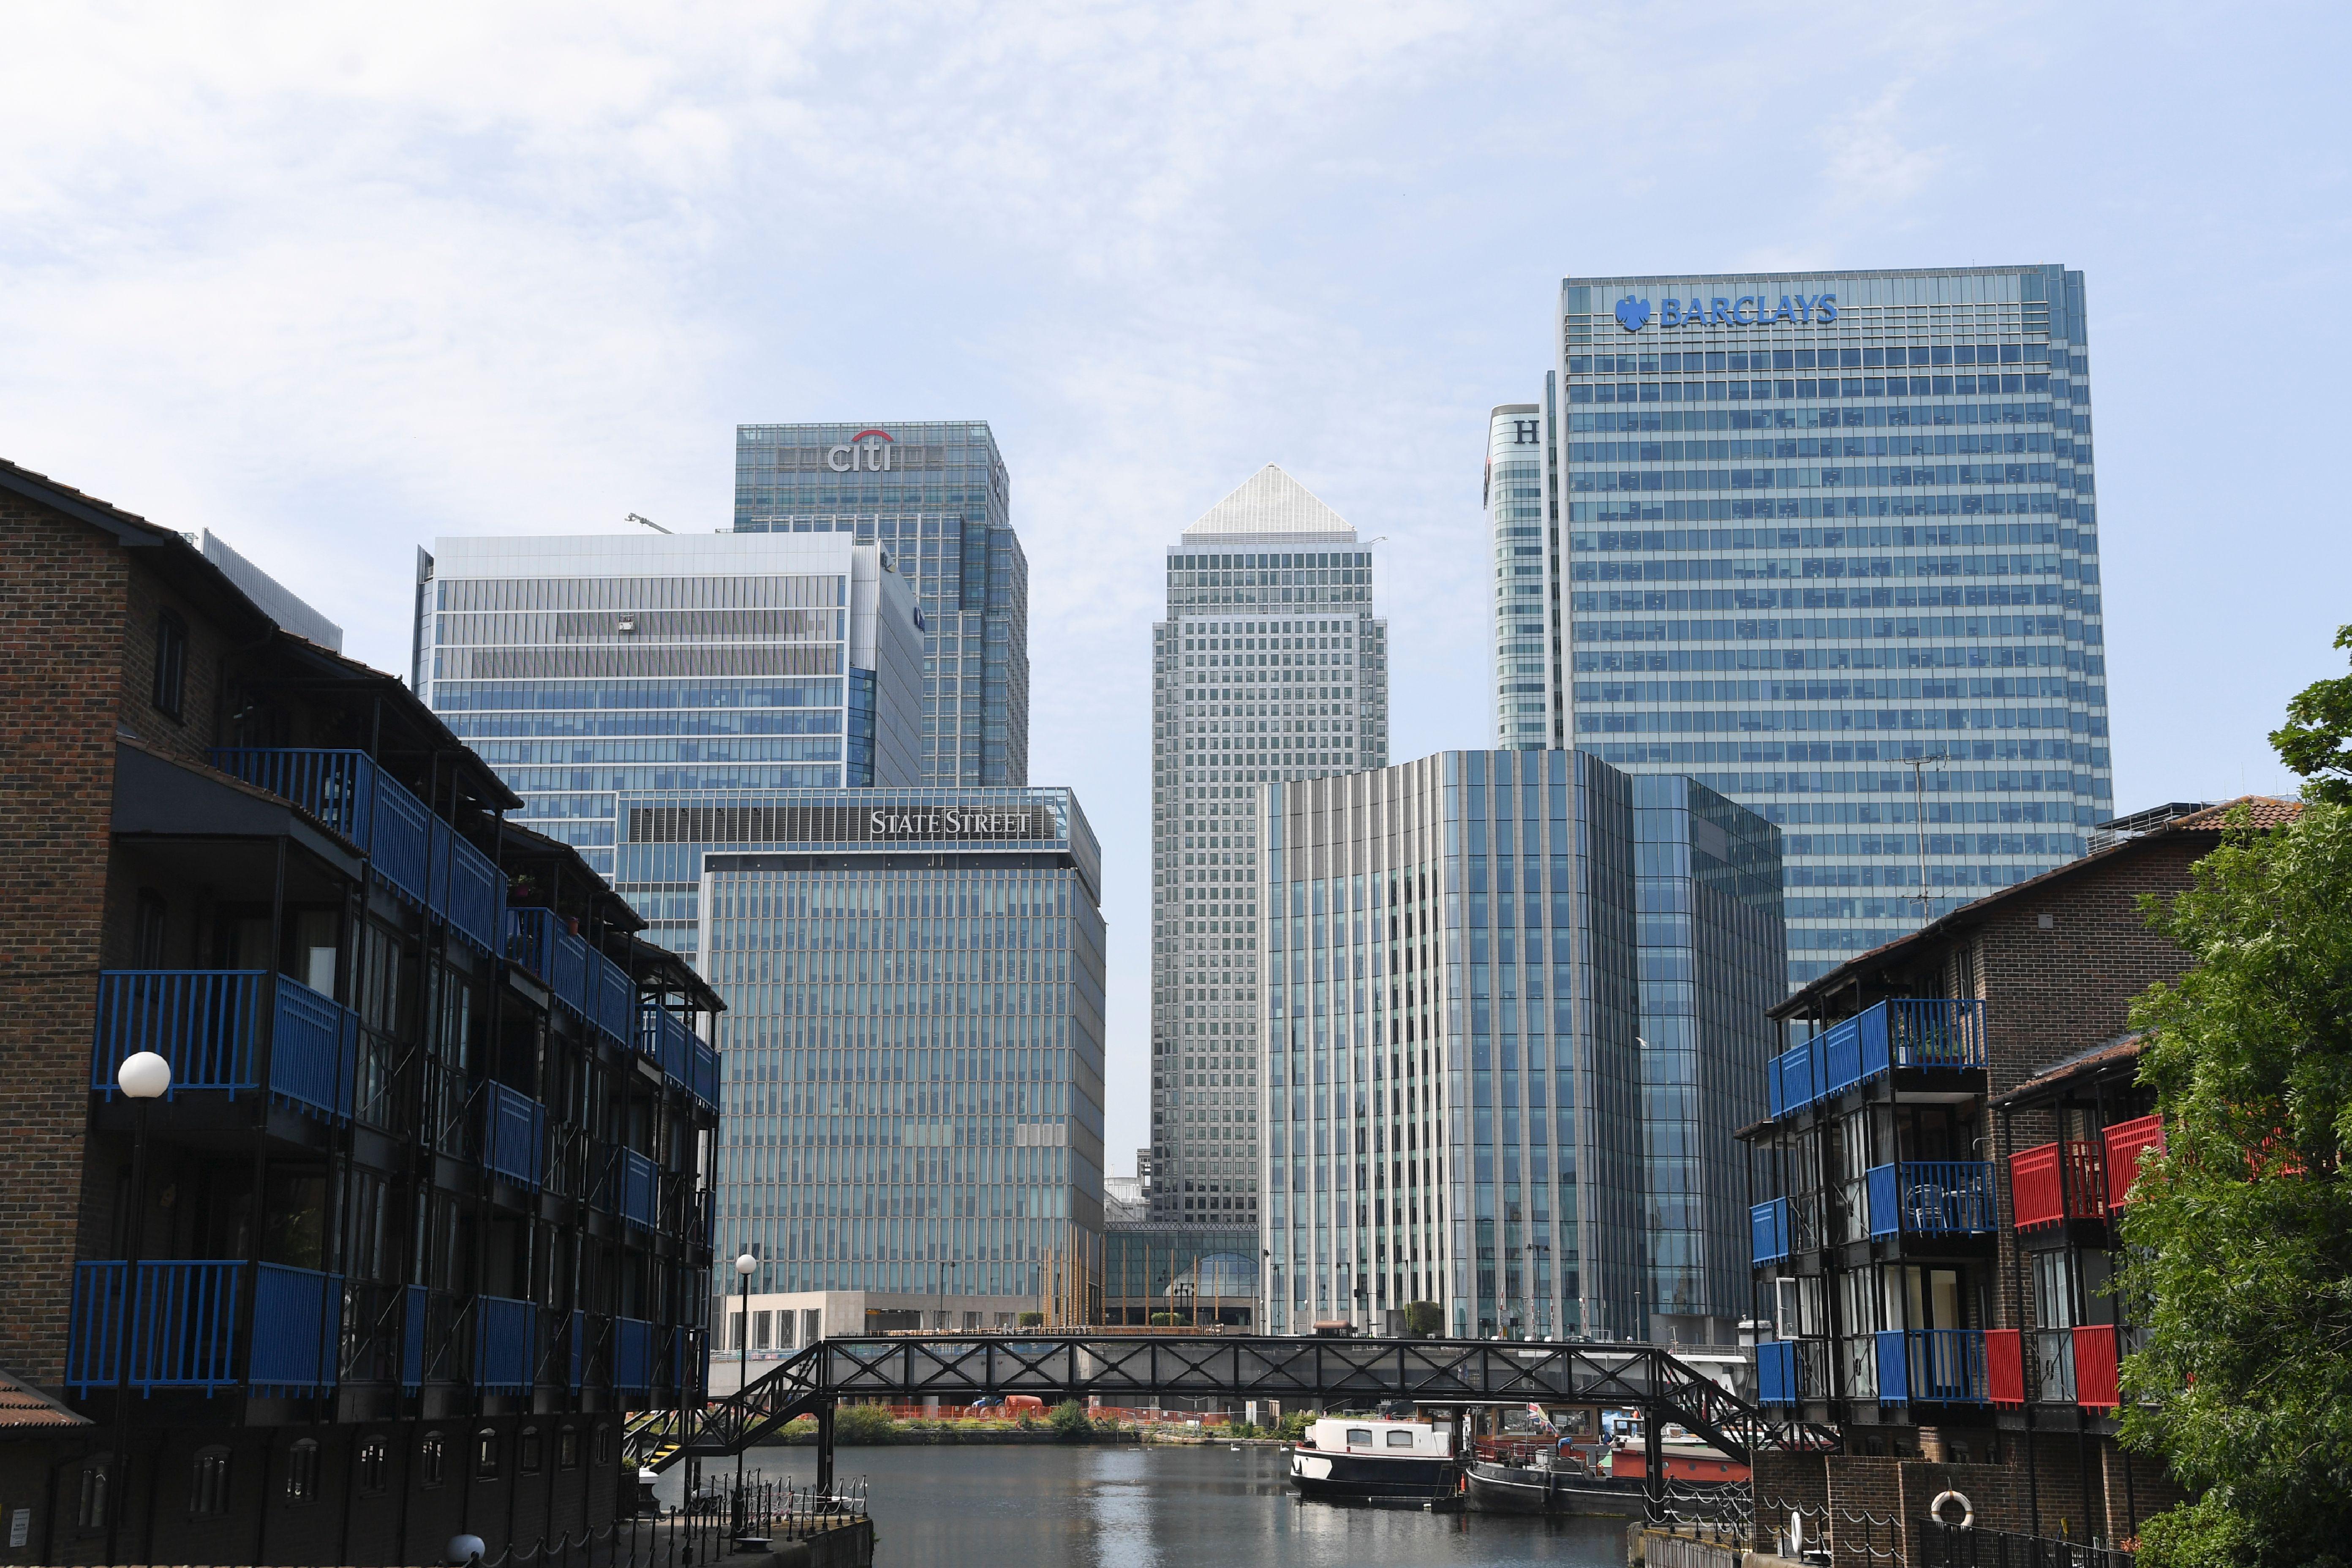 BRITAIN-QATAR-BANKING-FINANCE-FRAUD-BUSINESS-BARLCAYS